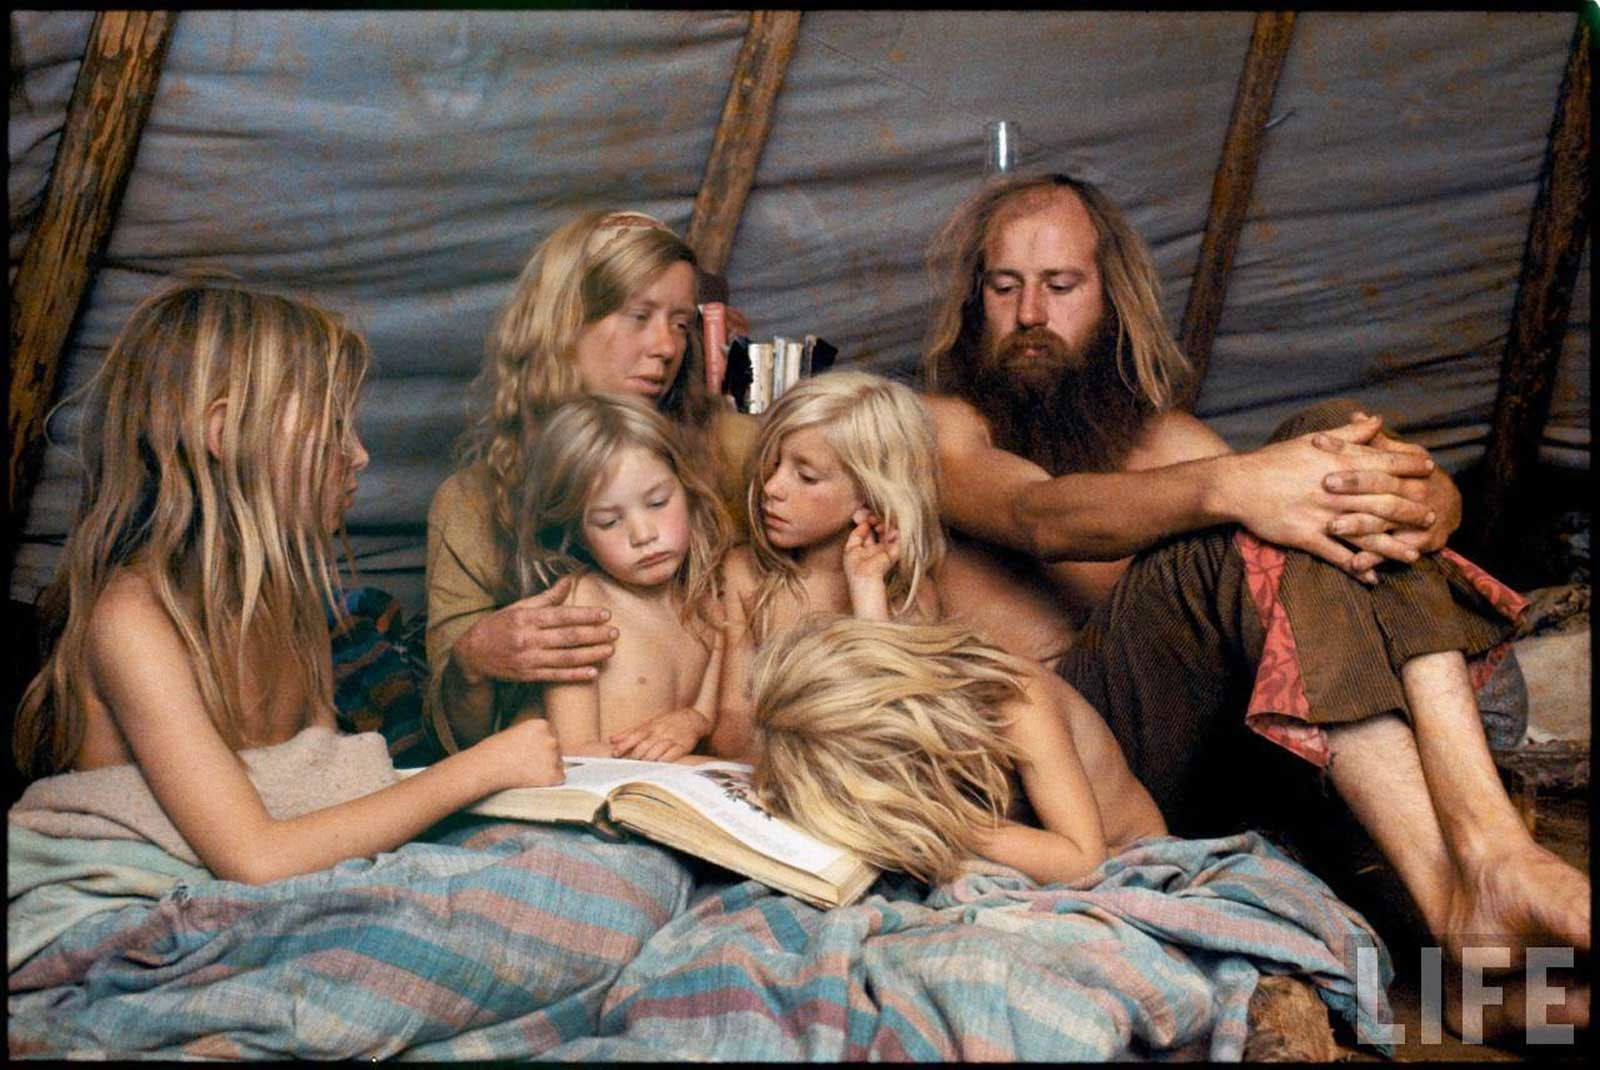 60s Hippy nudes vintage